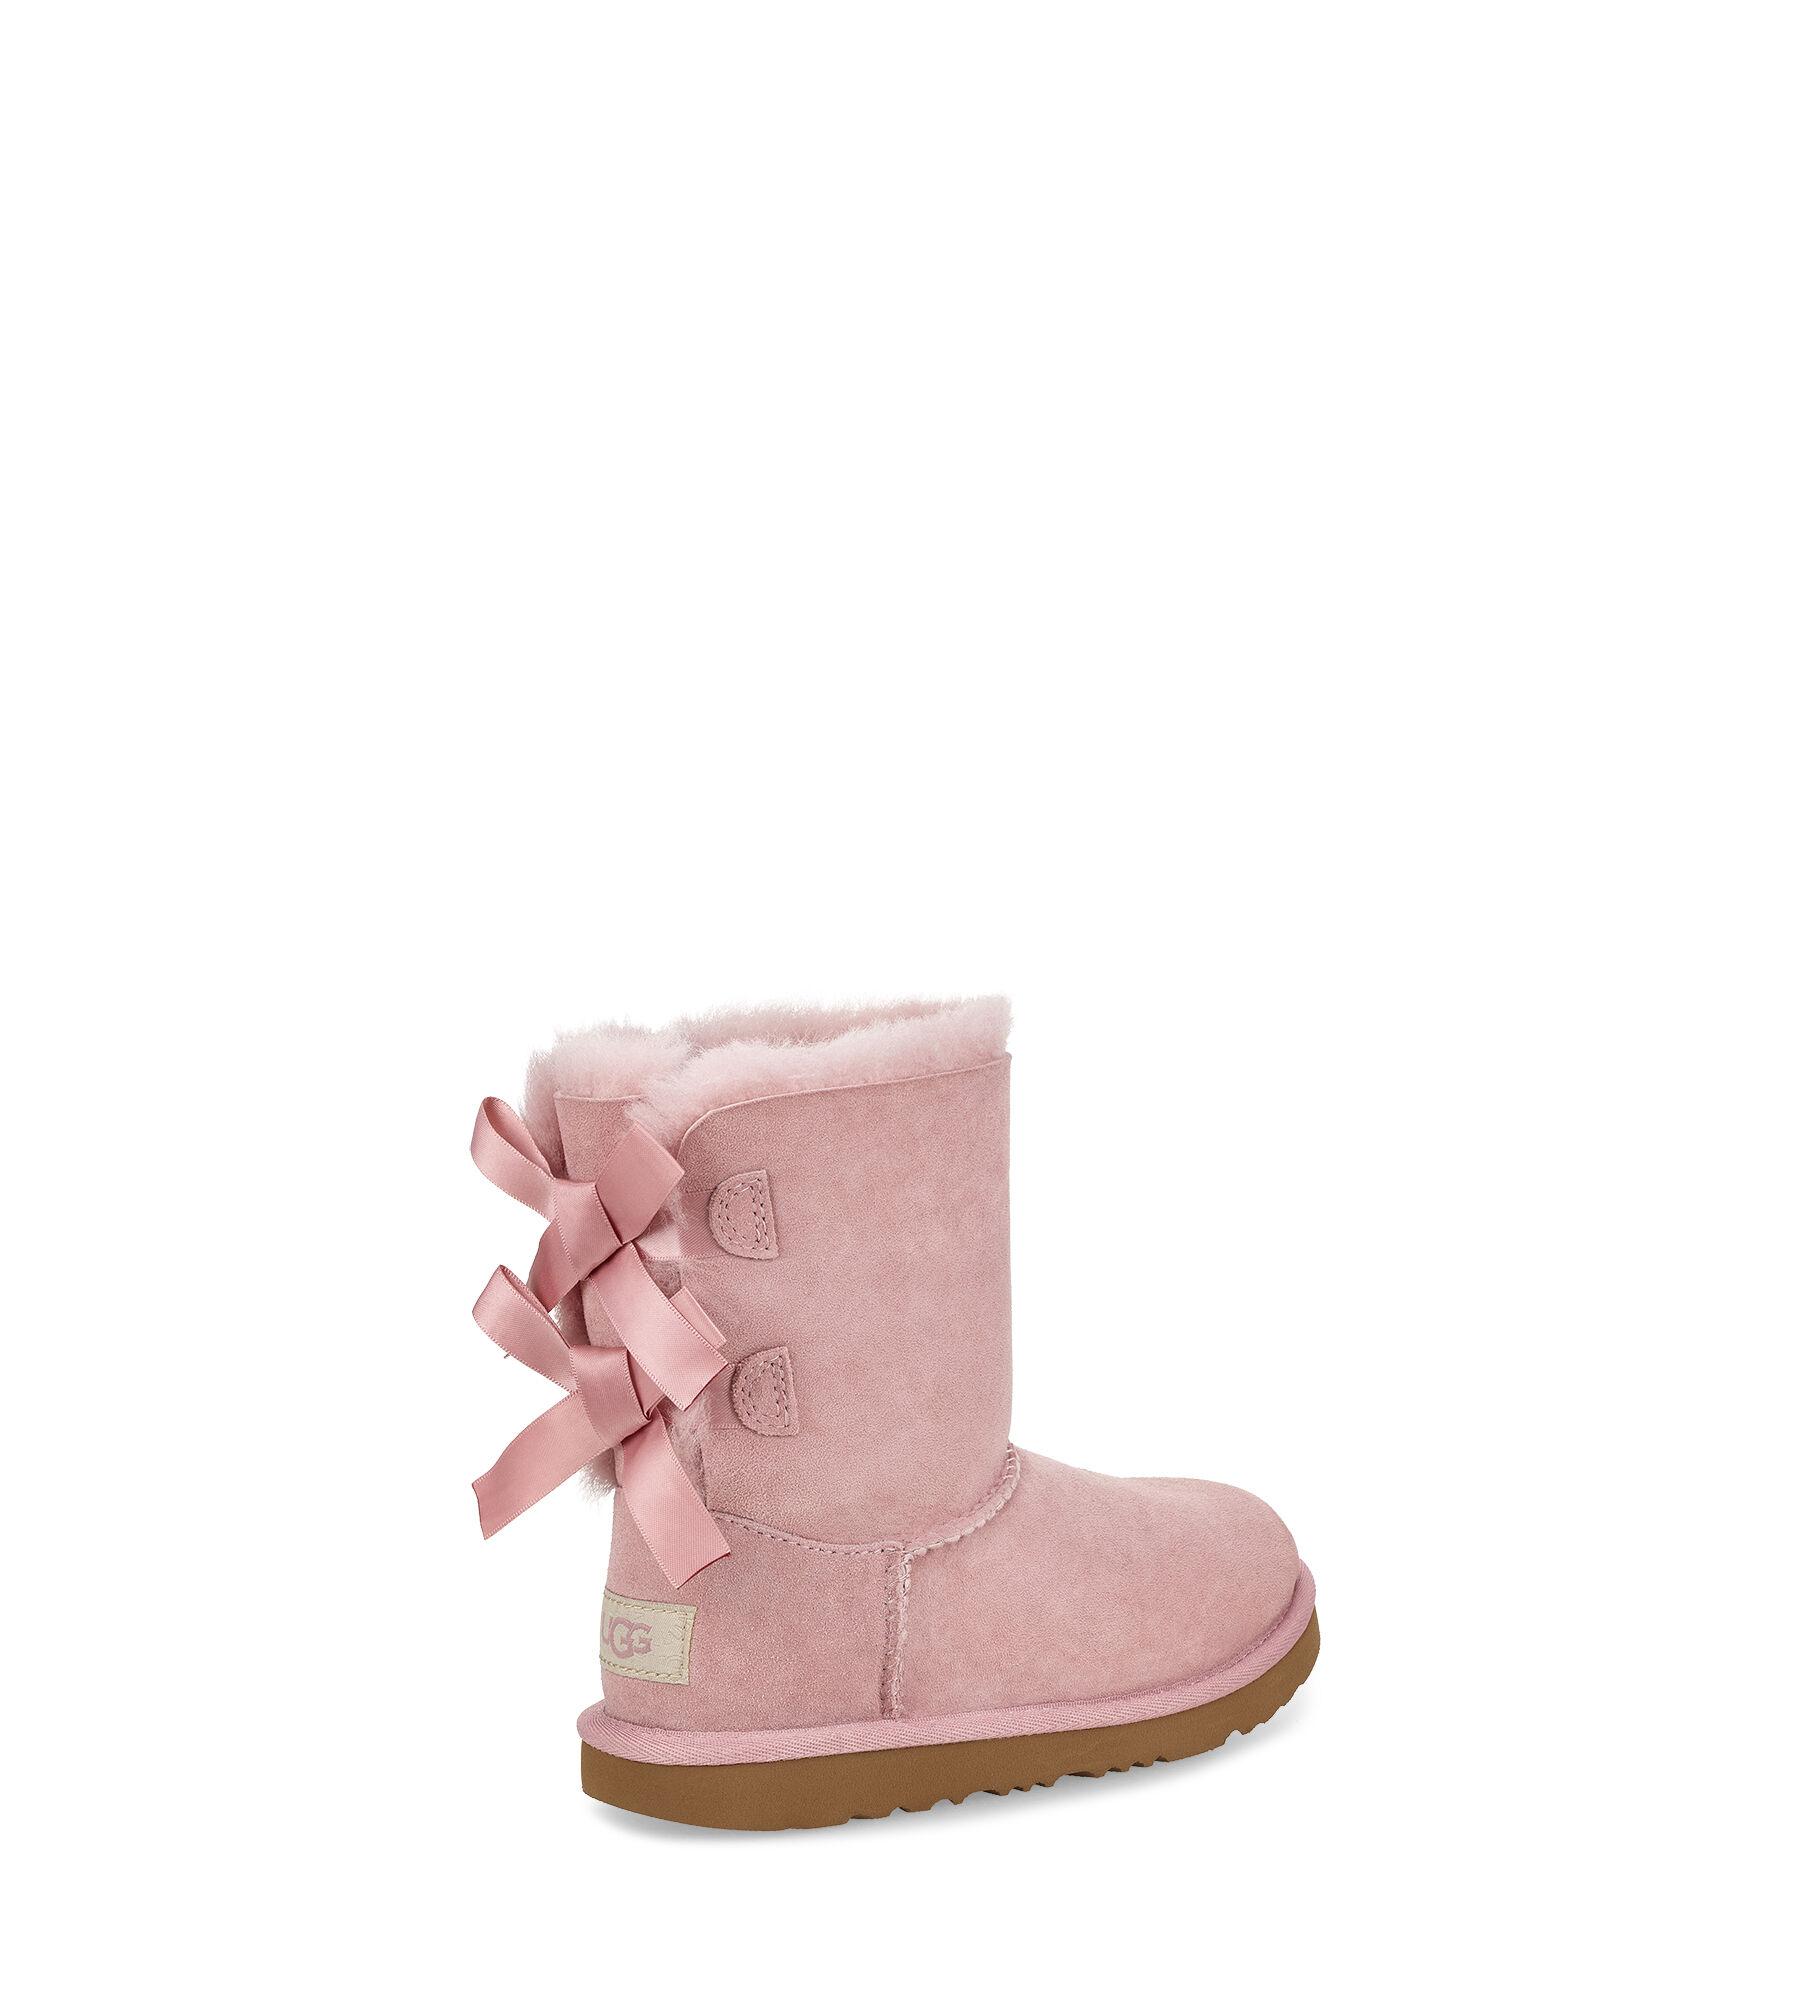 chaussure ugg enfant 31